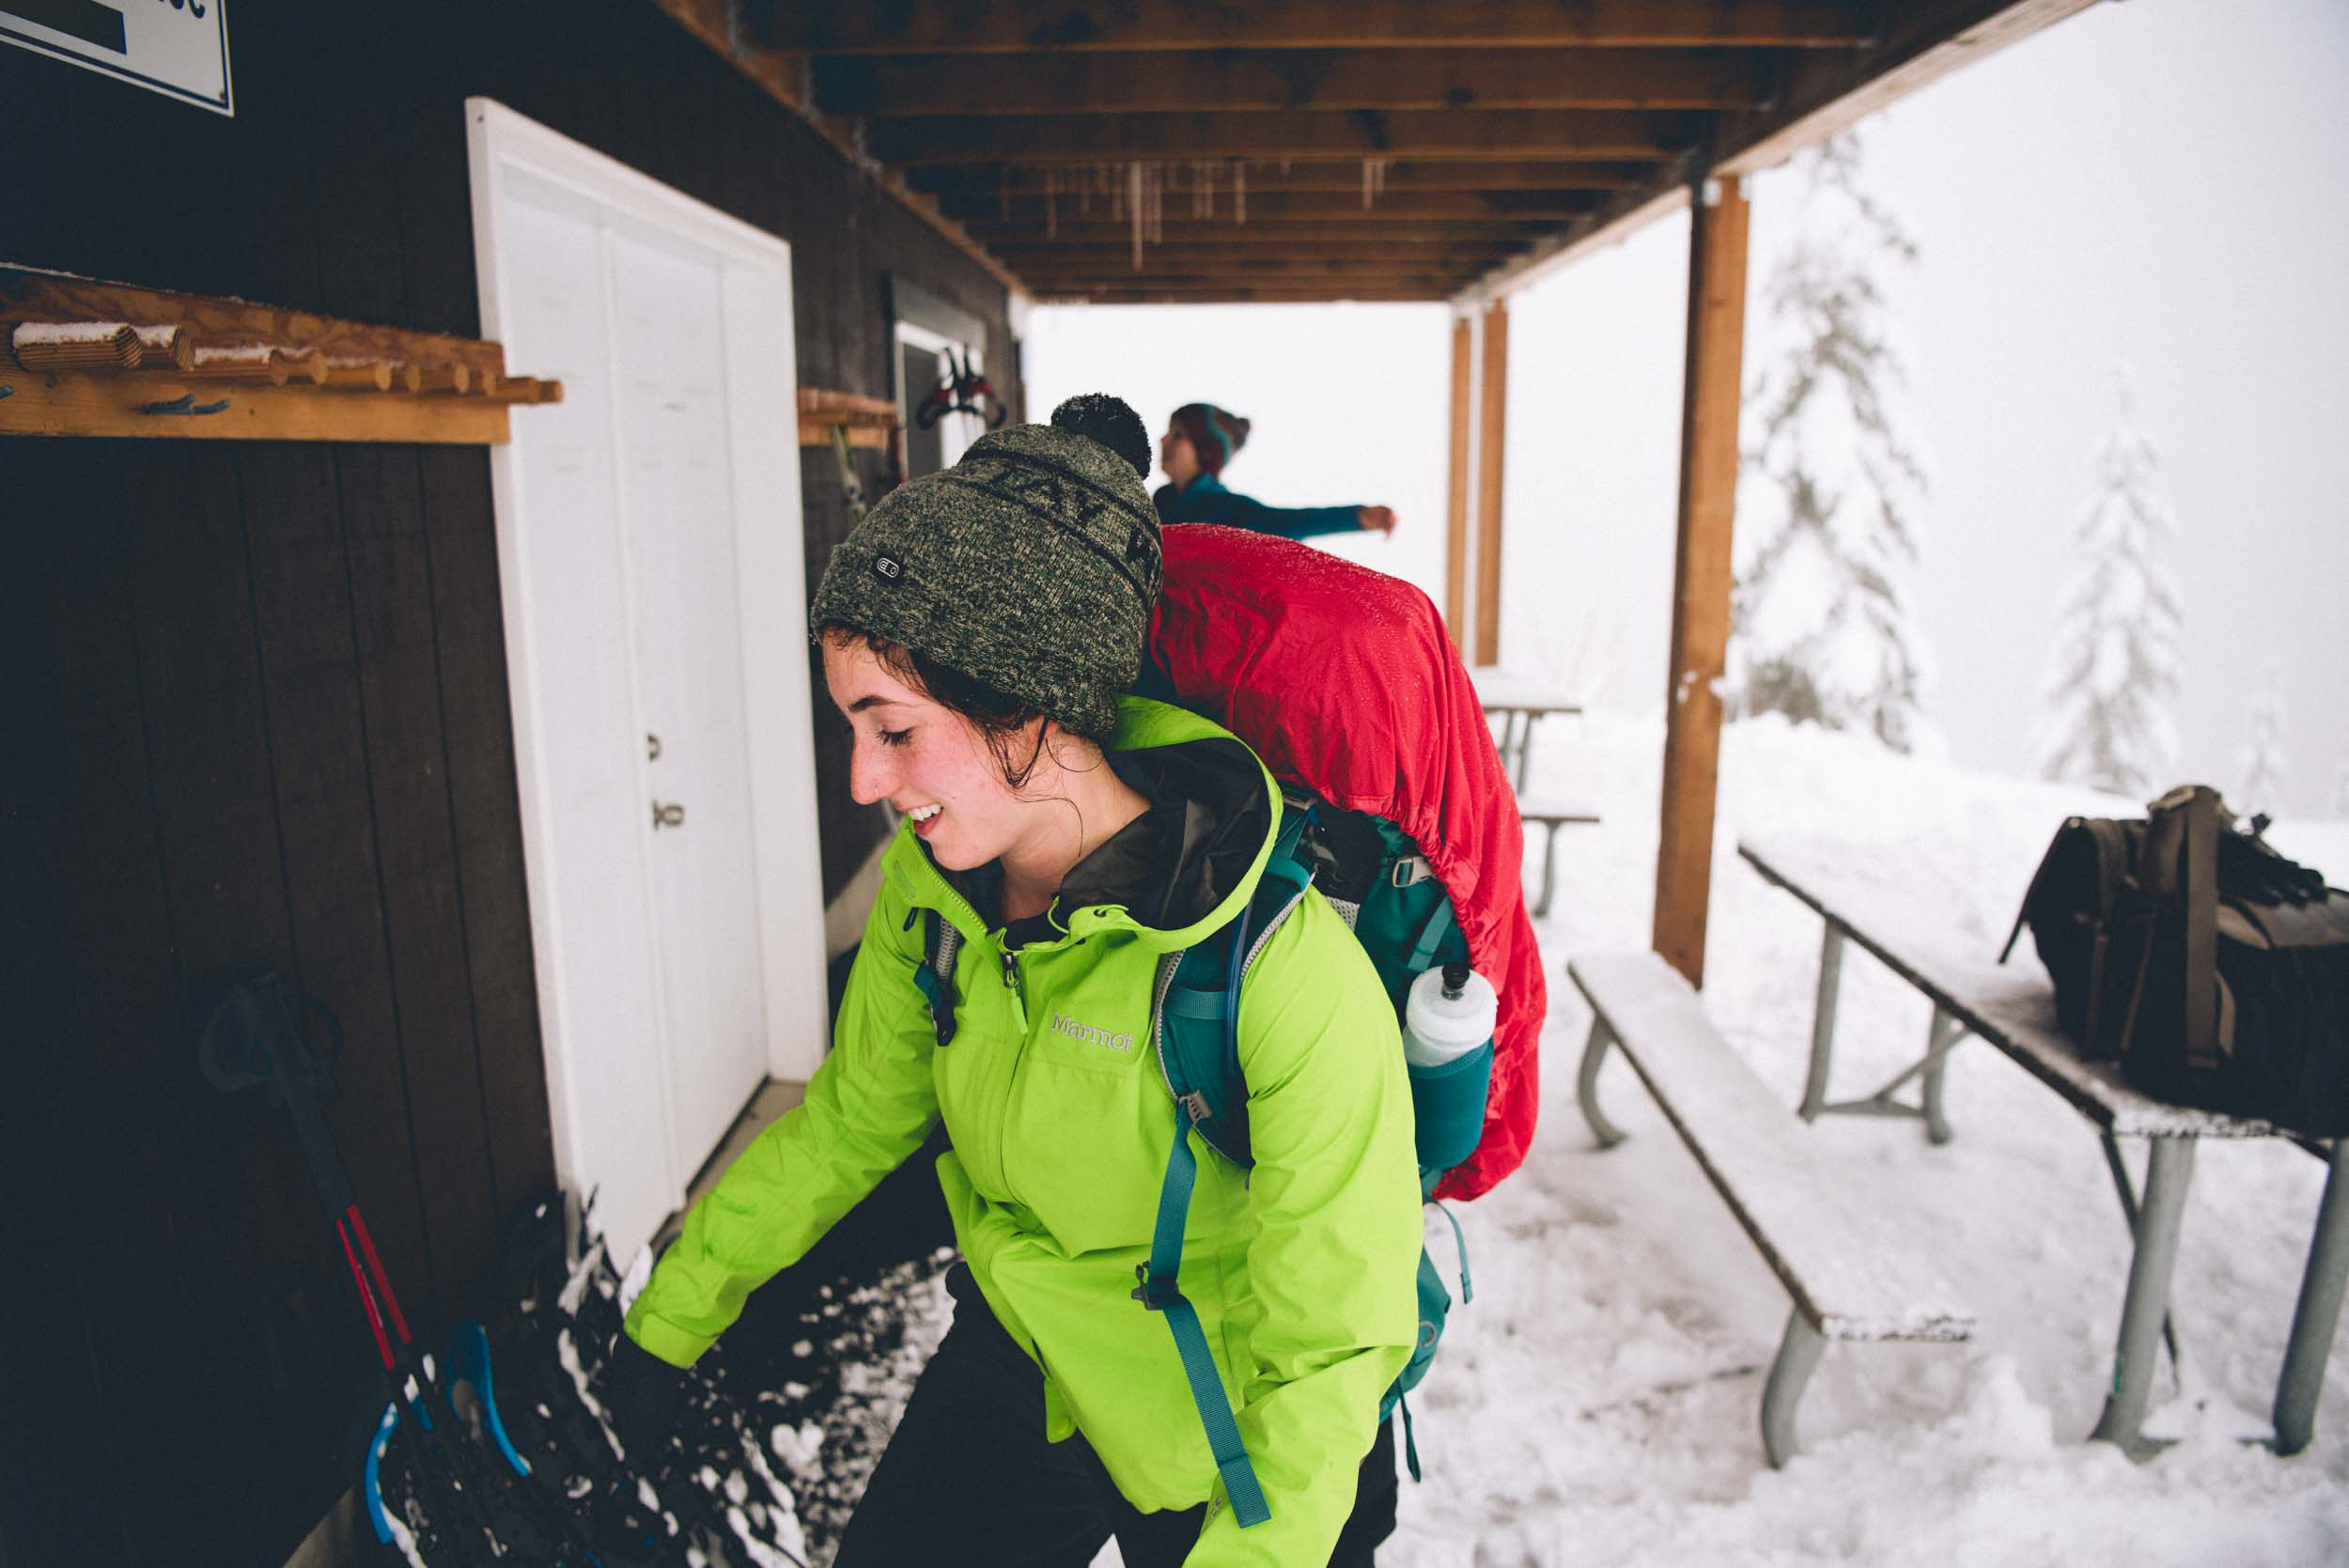 Miriam-Subbiah-Snow-Bowl-Hut-10.jpg